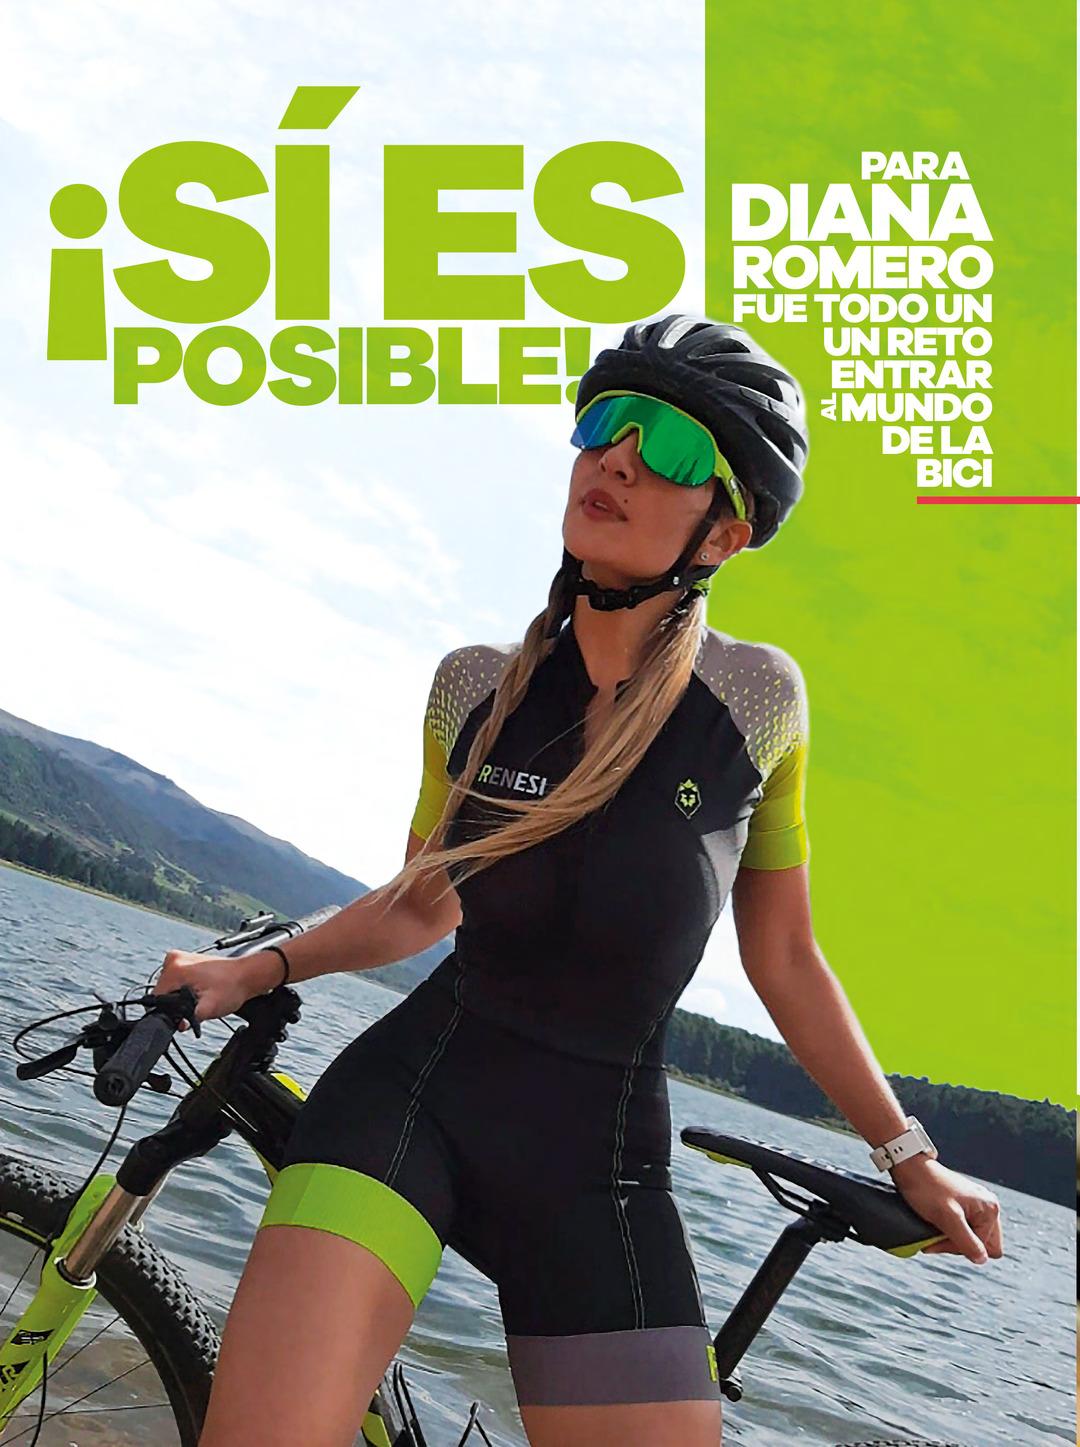 Page 40 of My Bike ED 34 - En mujer My Bike Diana Romero @dimarfit23 nos cuenta su historia.